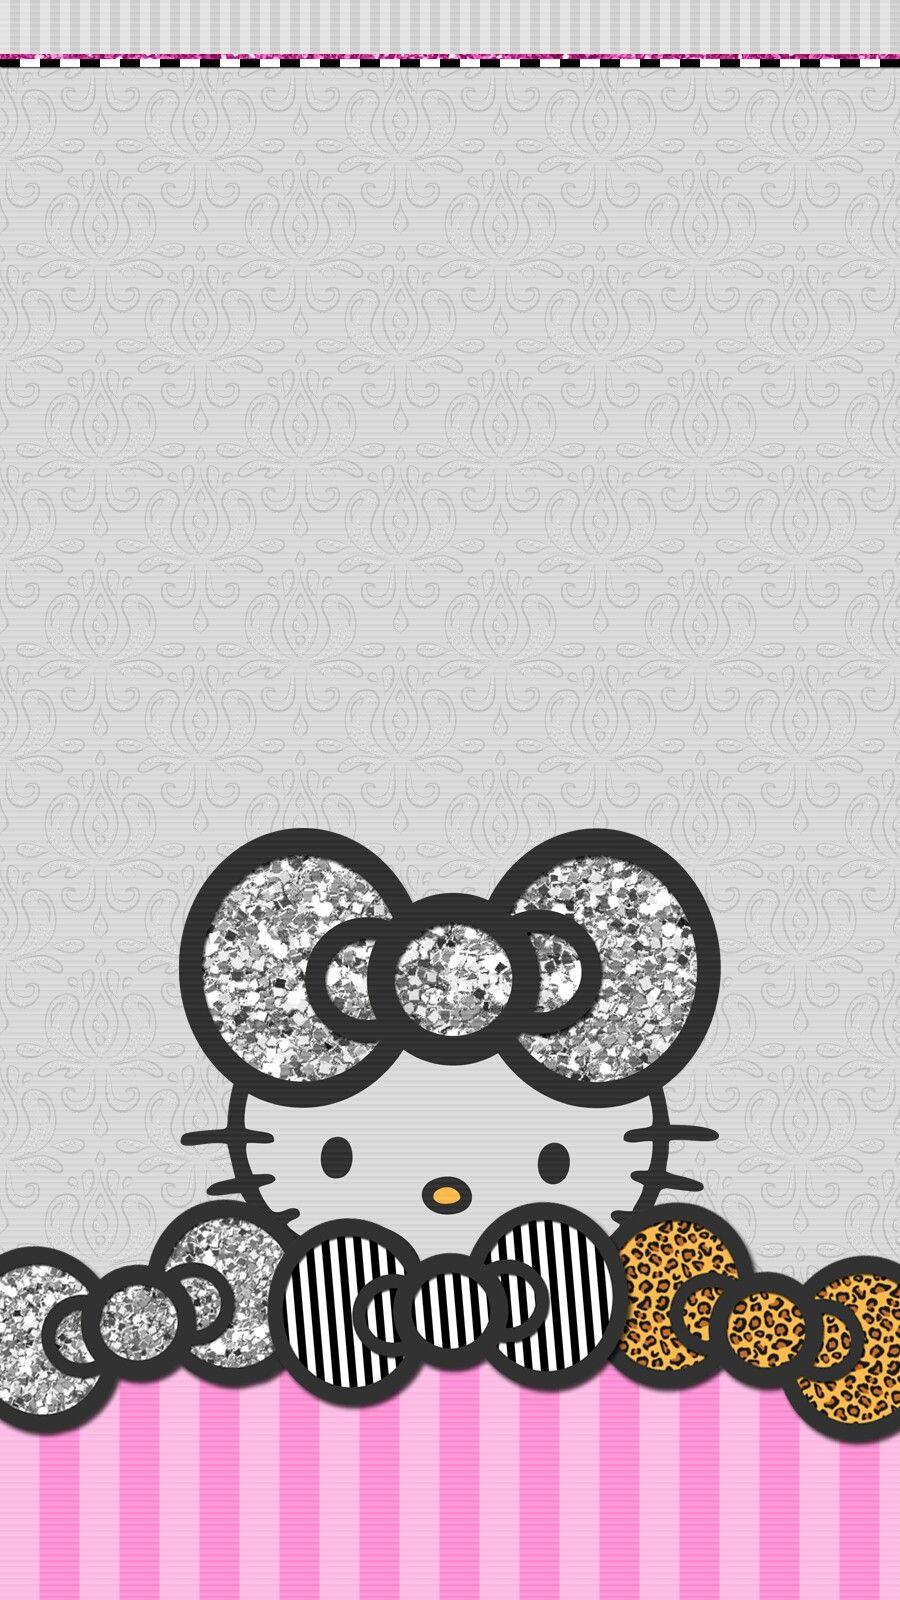 Amazing Wallpaper Hello Kitty Diamond - b0ee35f8c9a723424b6732c2ef107e82  Photograph_233646.jpg